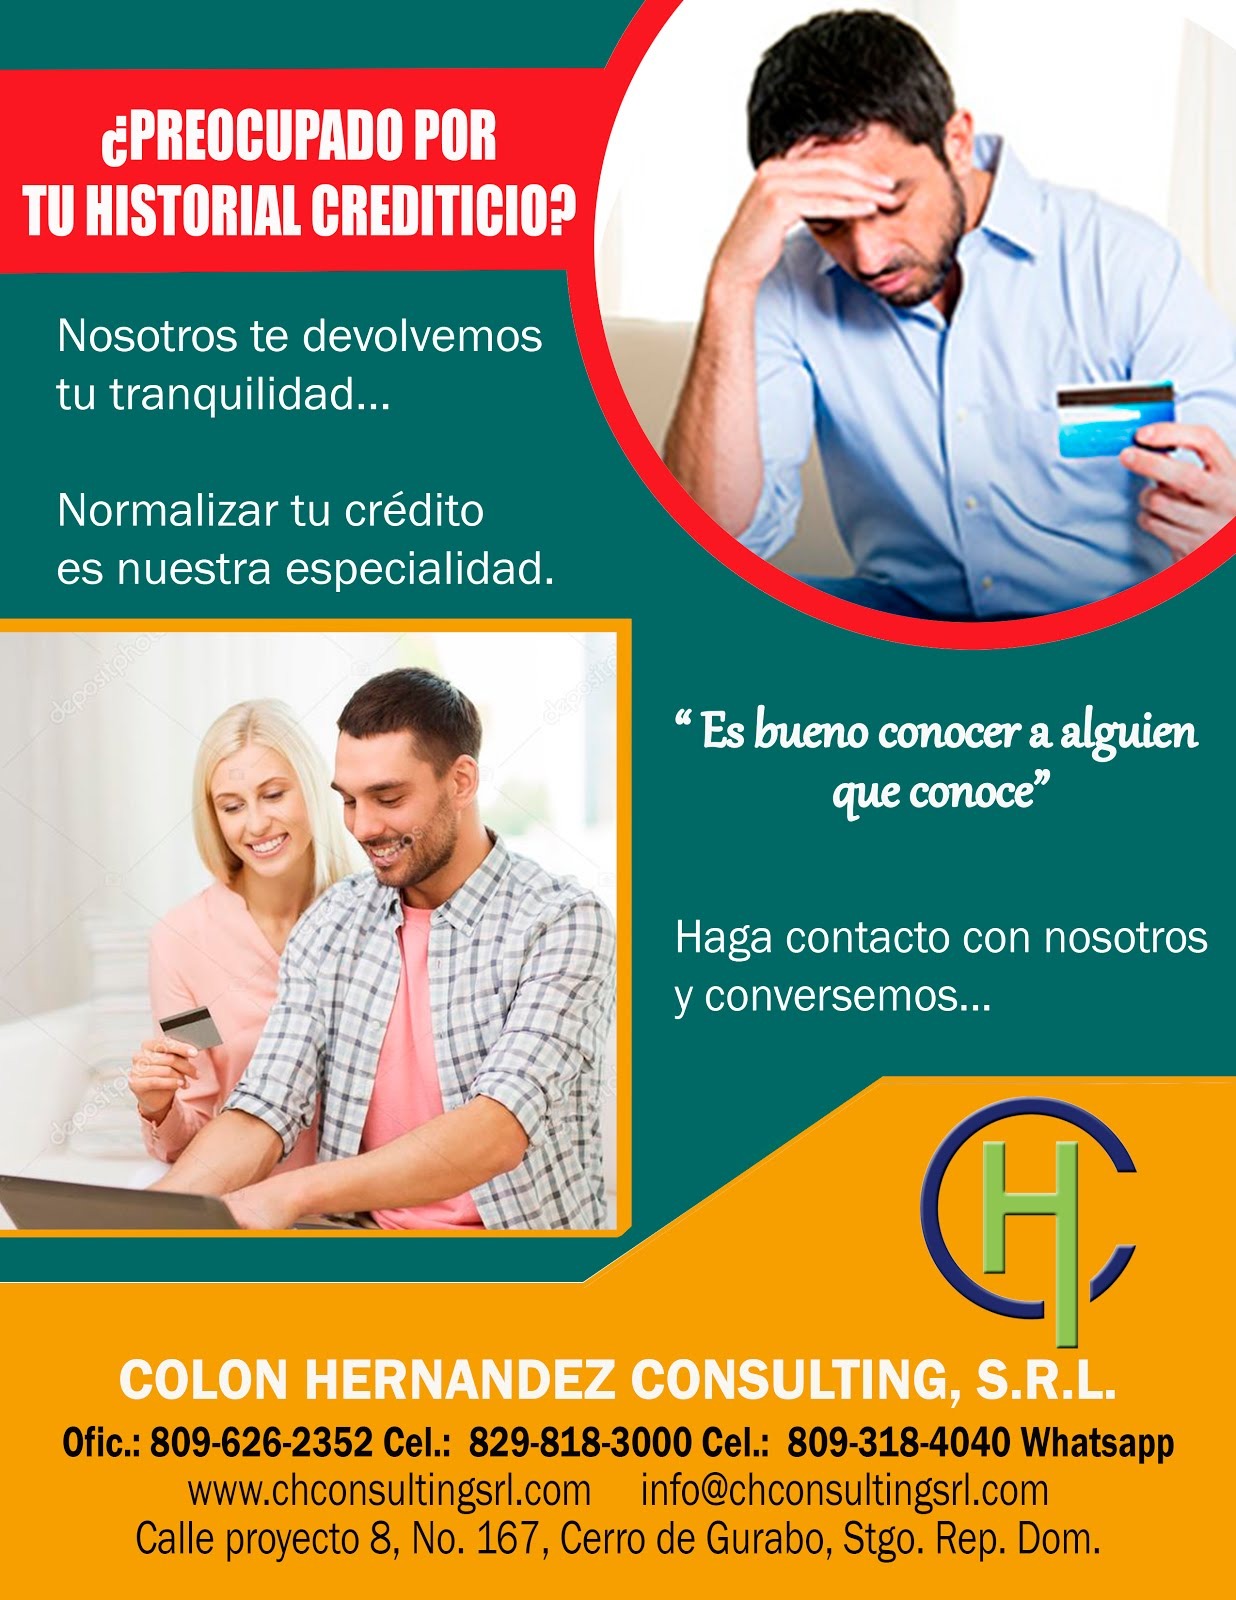 COLON HERNANDEZ CONSULTING